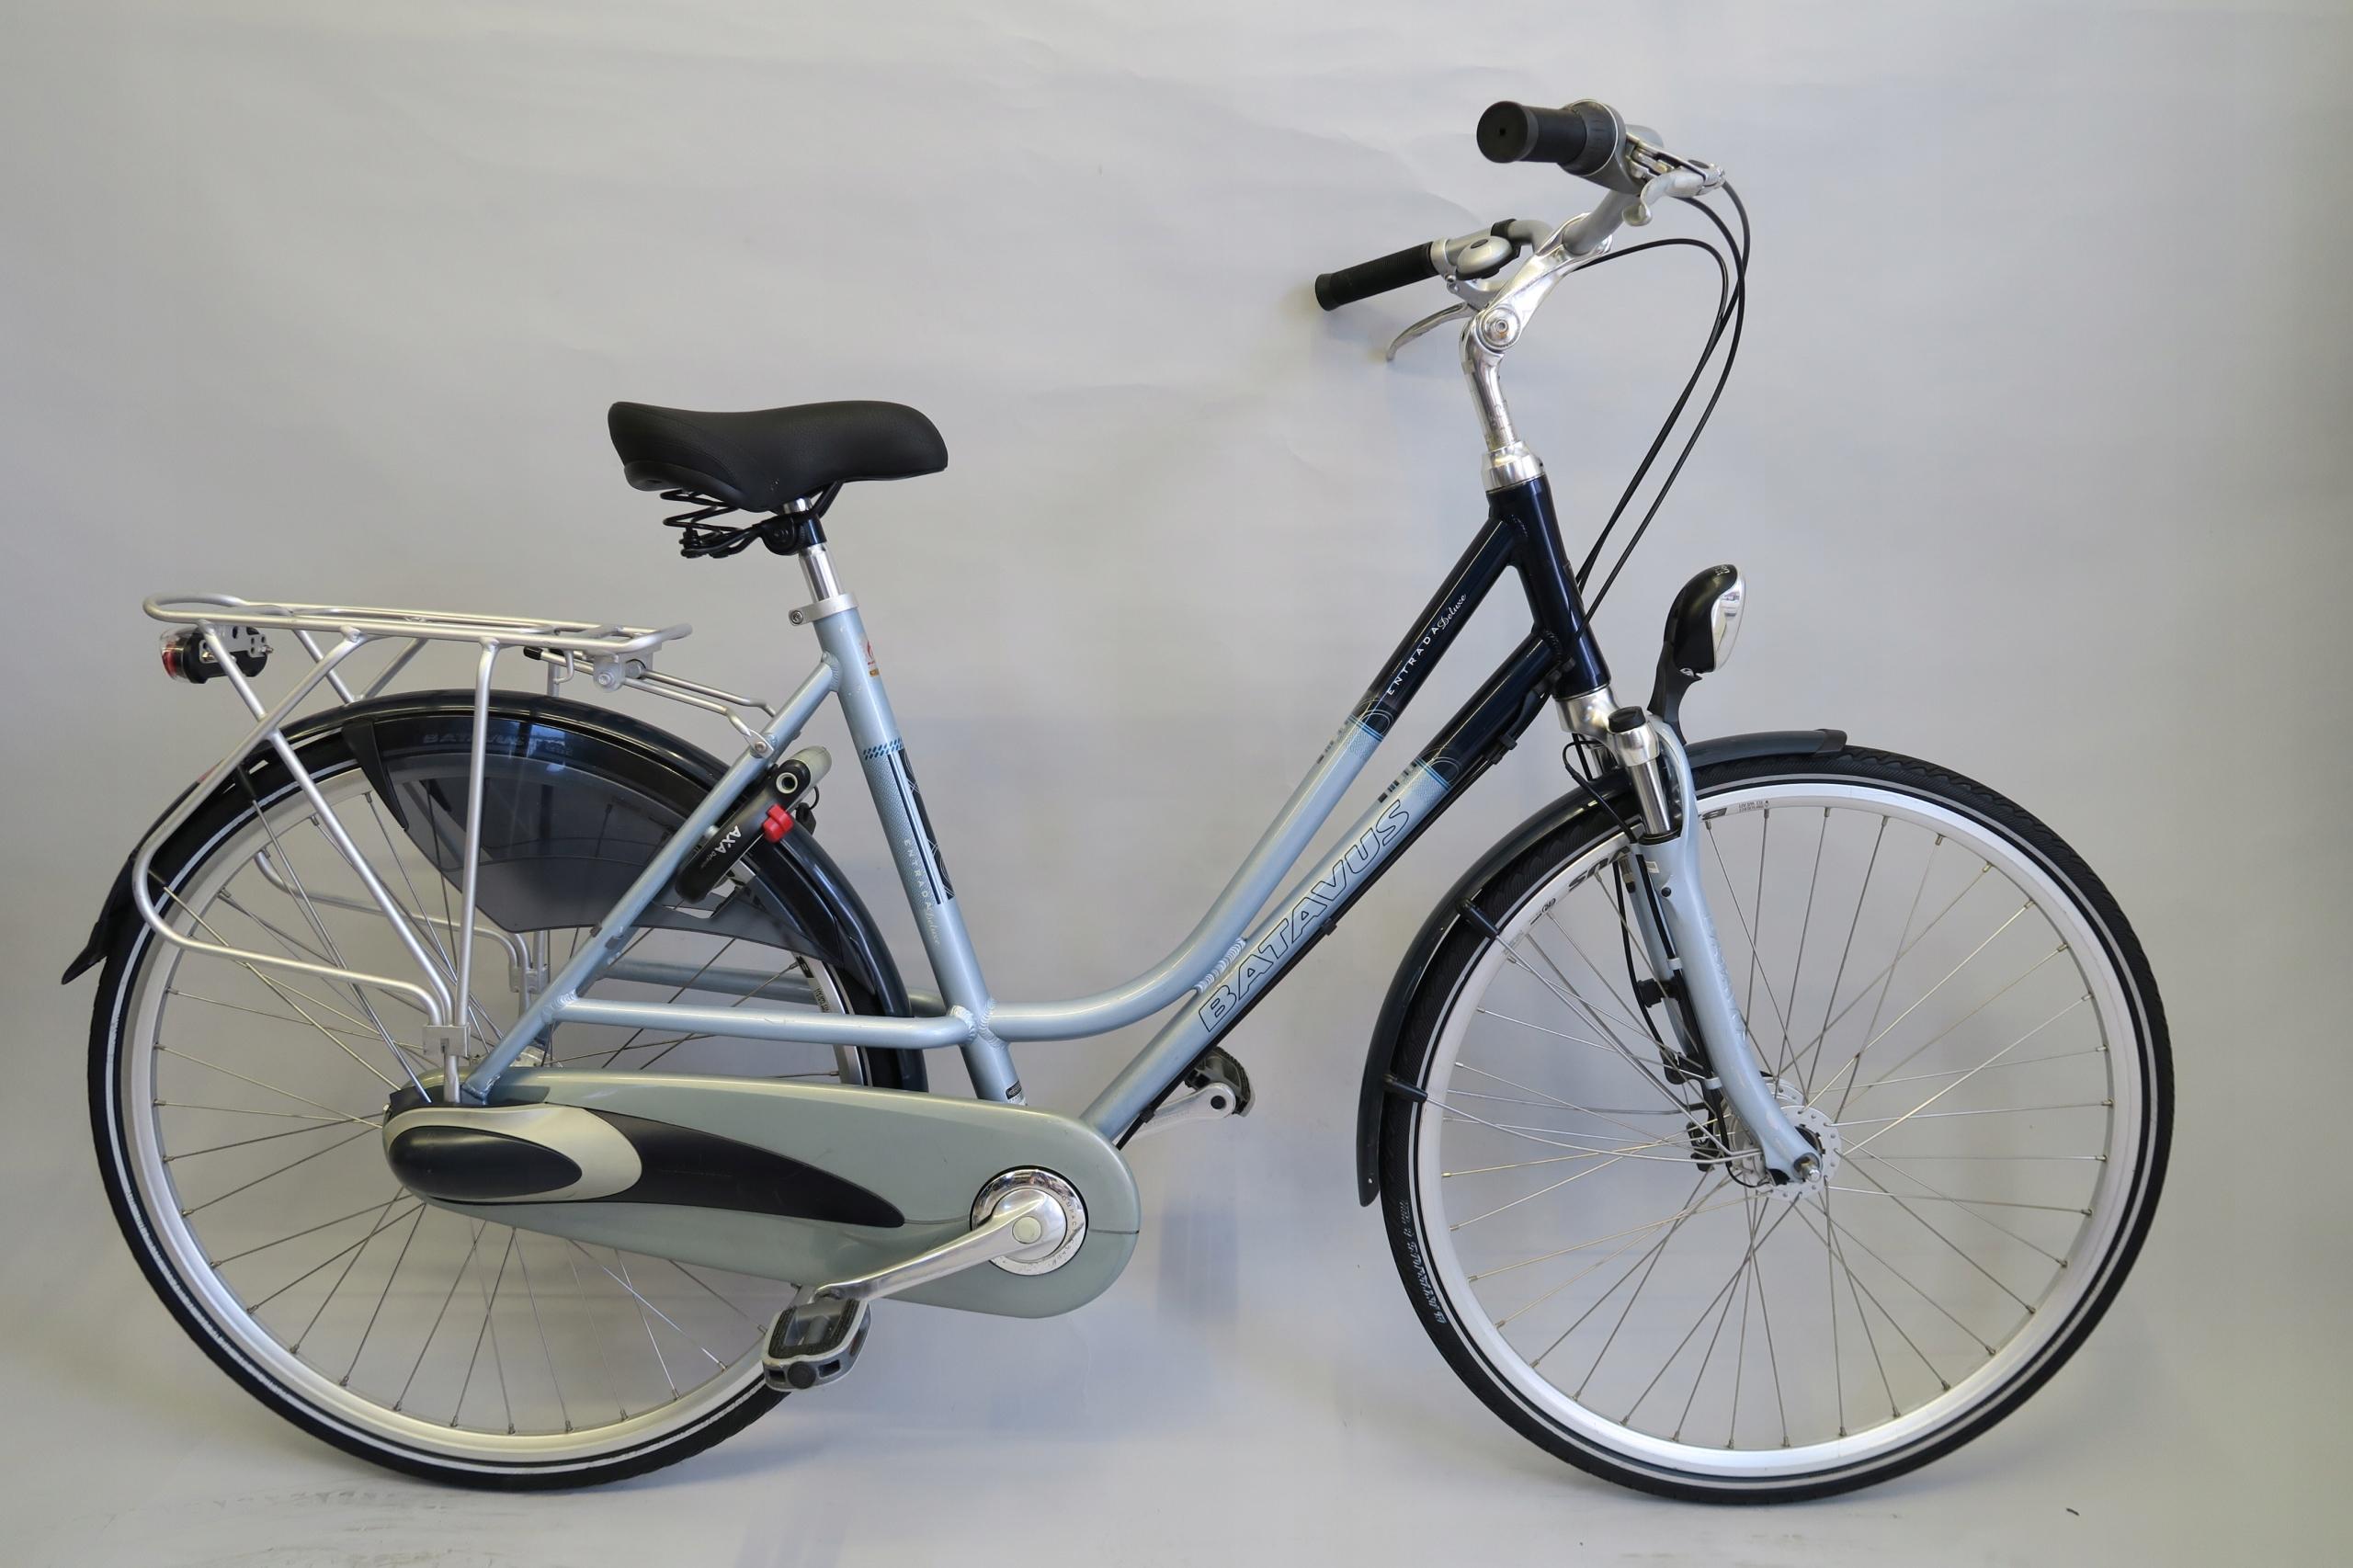 Markowy rower holenderski Batavus Entrada Nexus